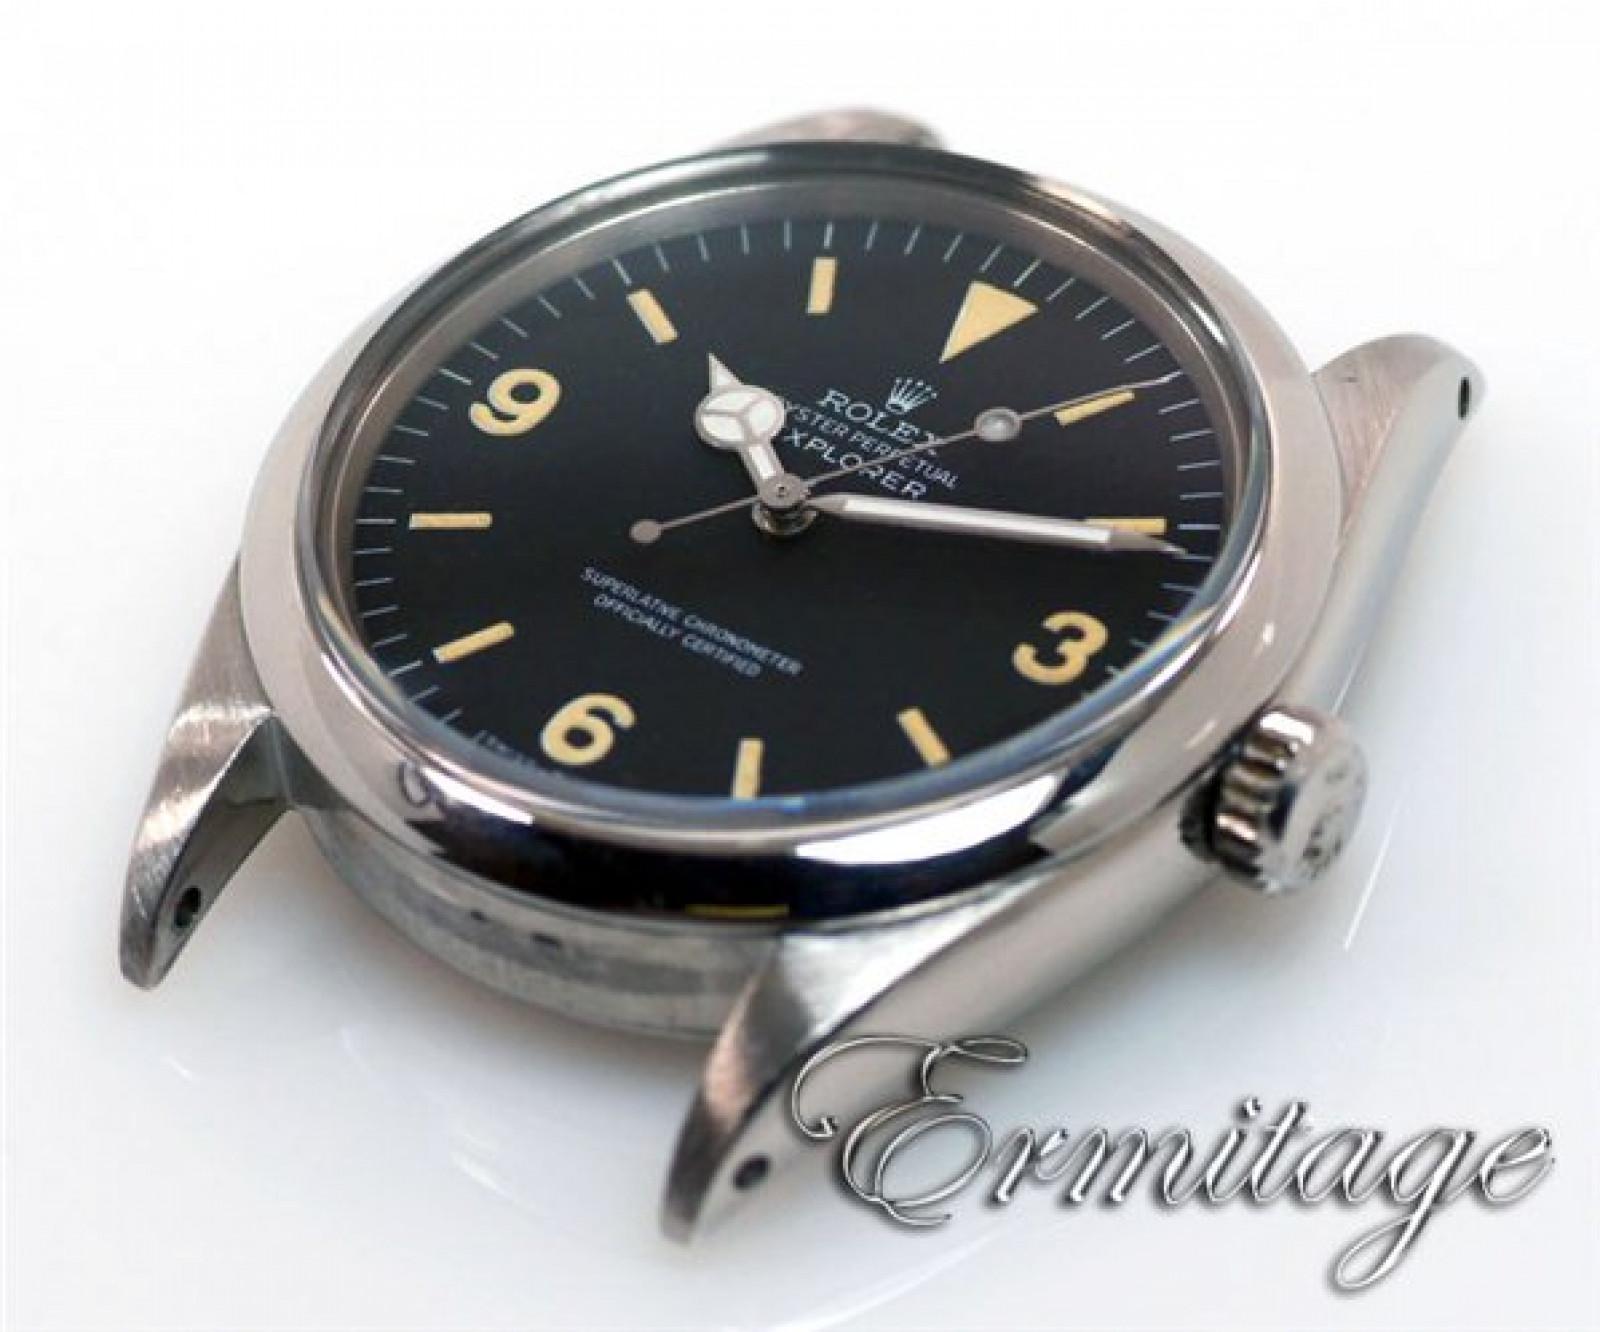 Vintage Rolex Explorer 1016 Steel with Blue Dial